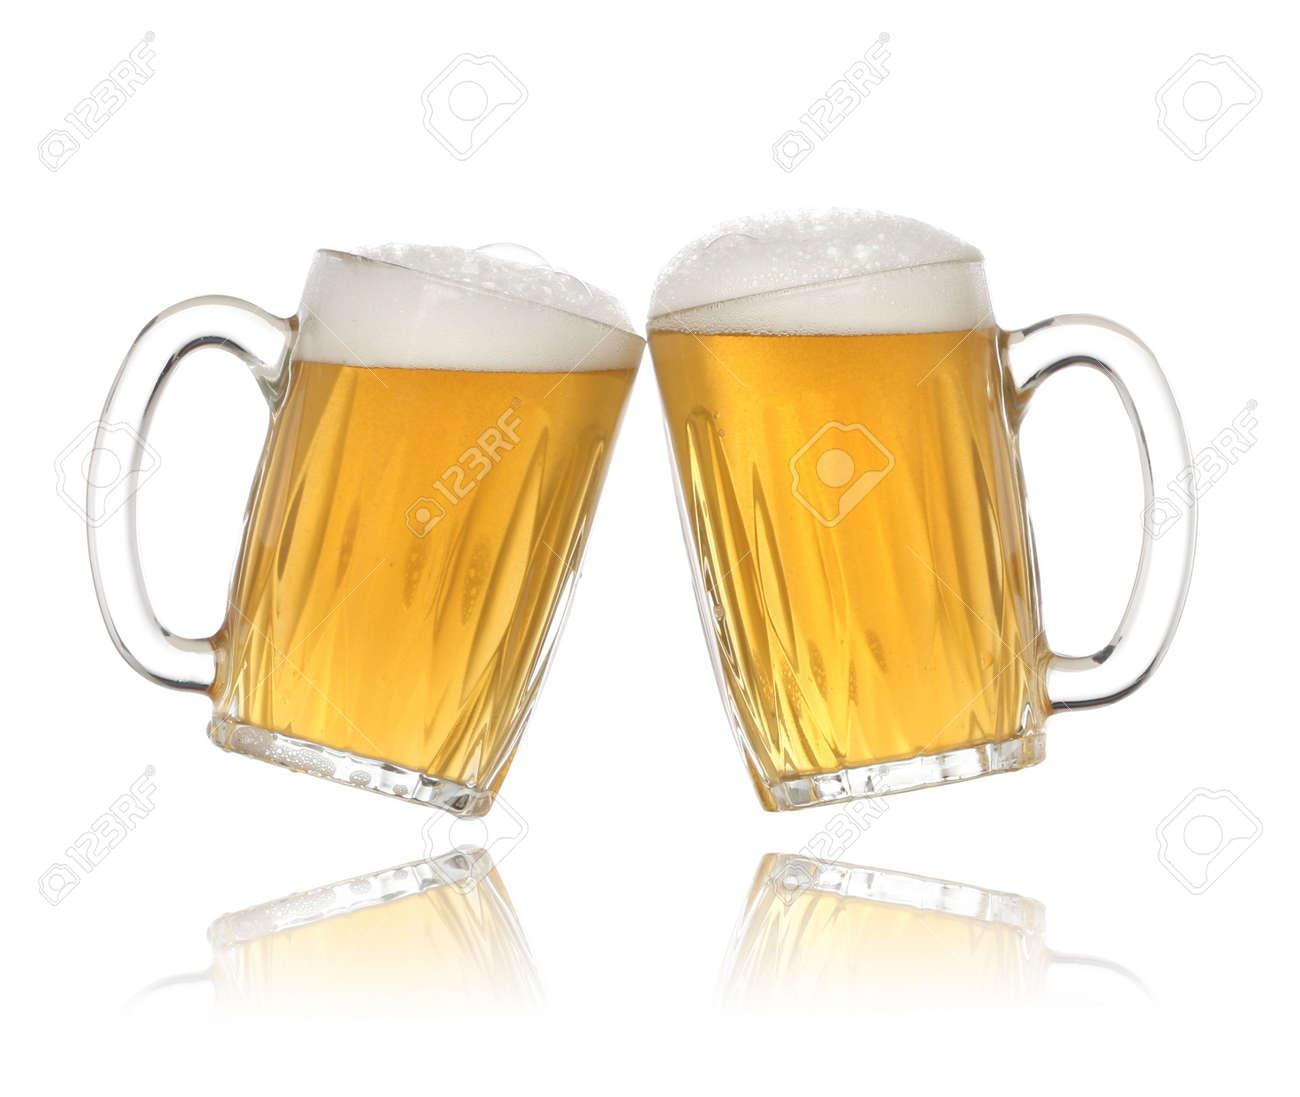 http://previews.123rf.com/images/erdosain/erdosain0906/erdosain090600029/4956145-Pair-of-beer-glasses-making-a-toast-Beer-splash-Stock-Photo.jpg